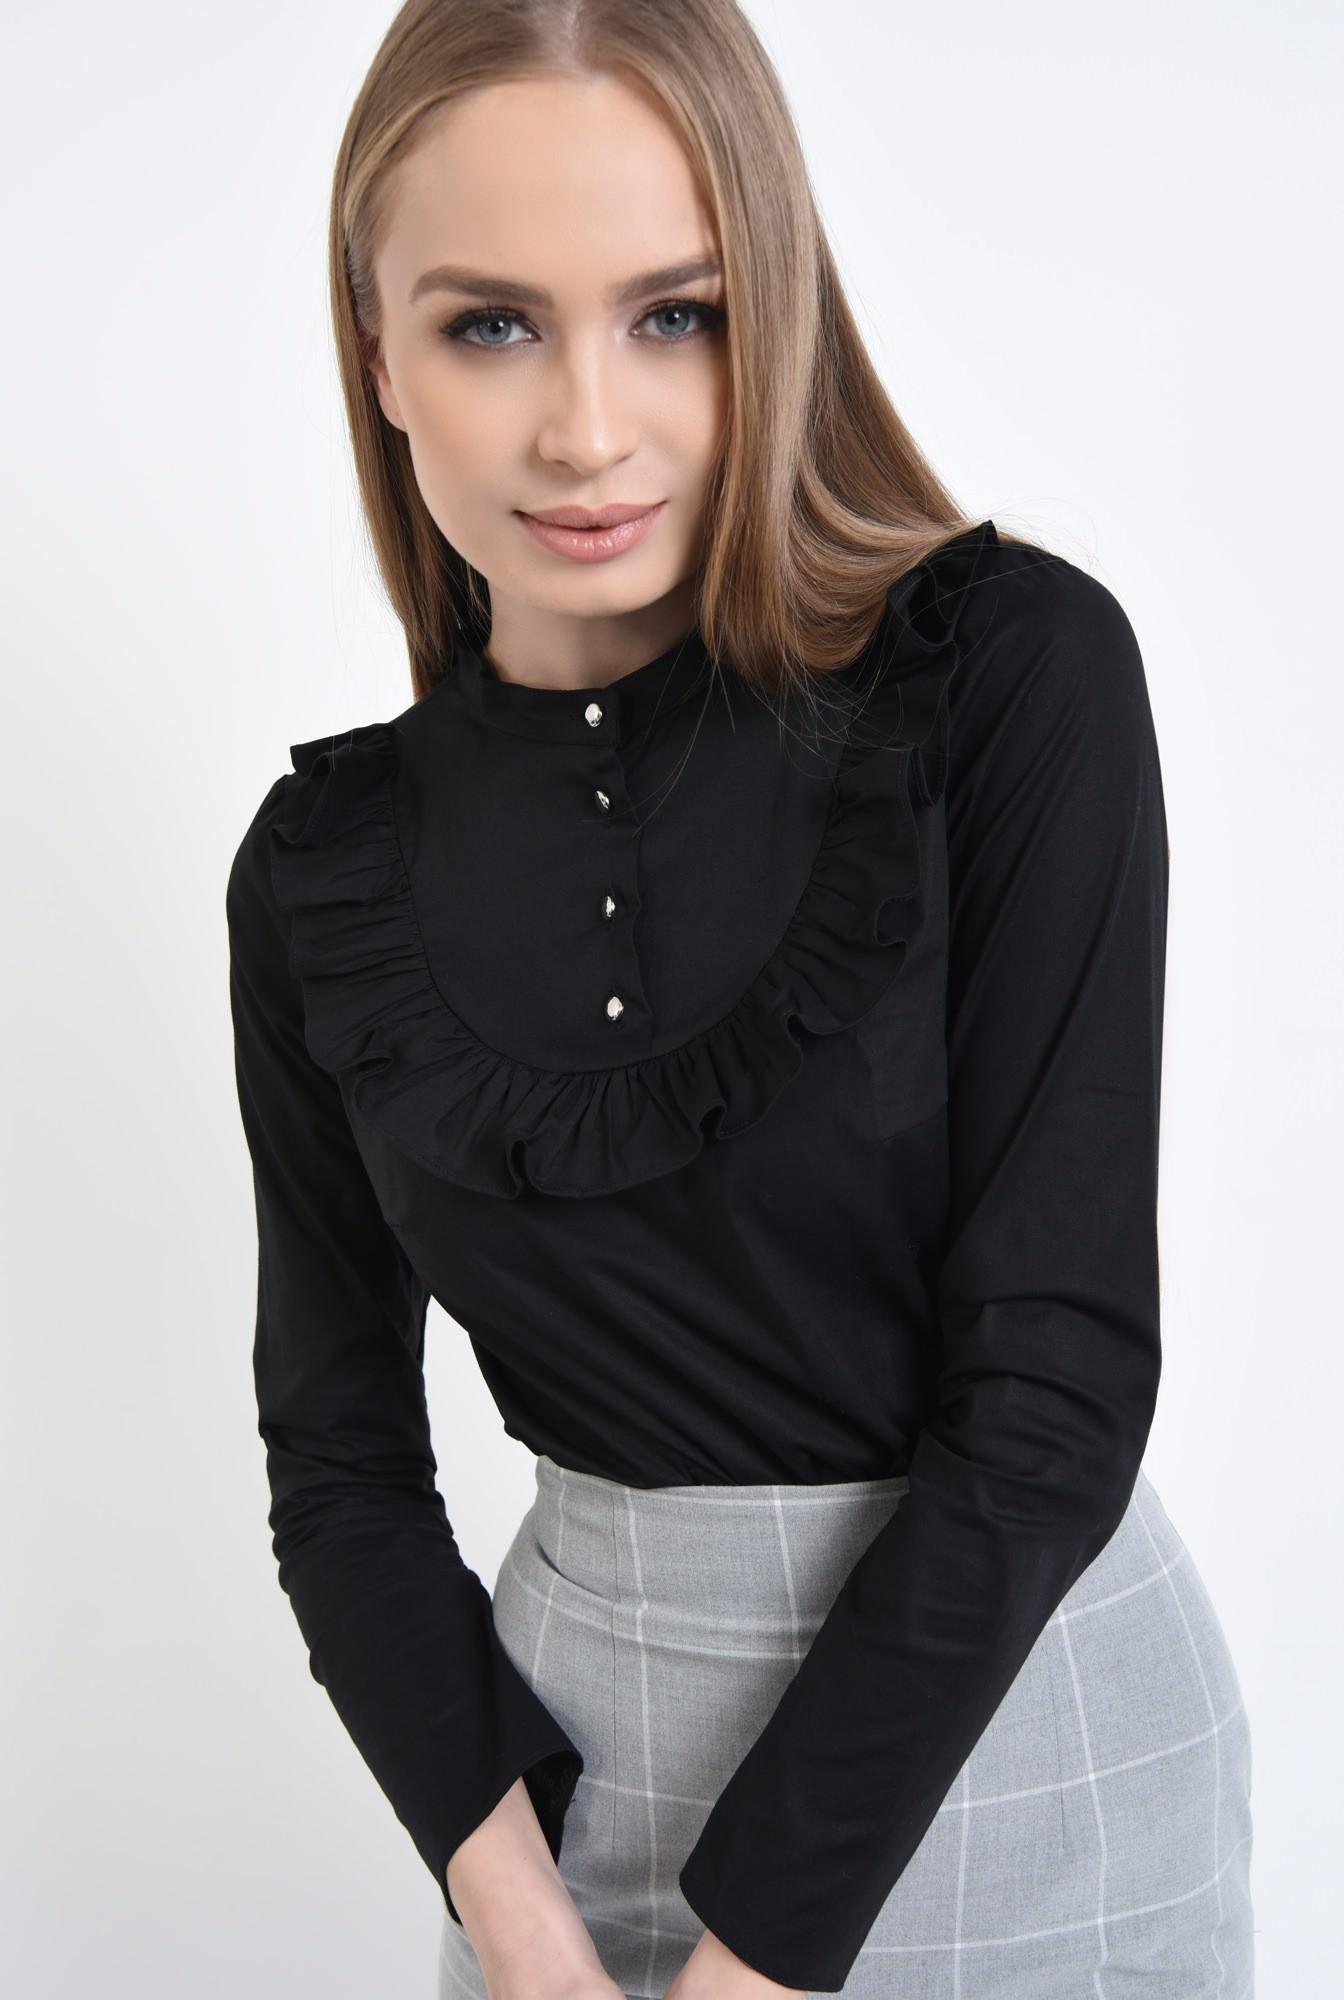 2 - Bluza casual, negru, bumbac